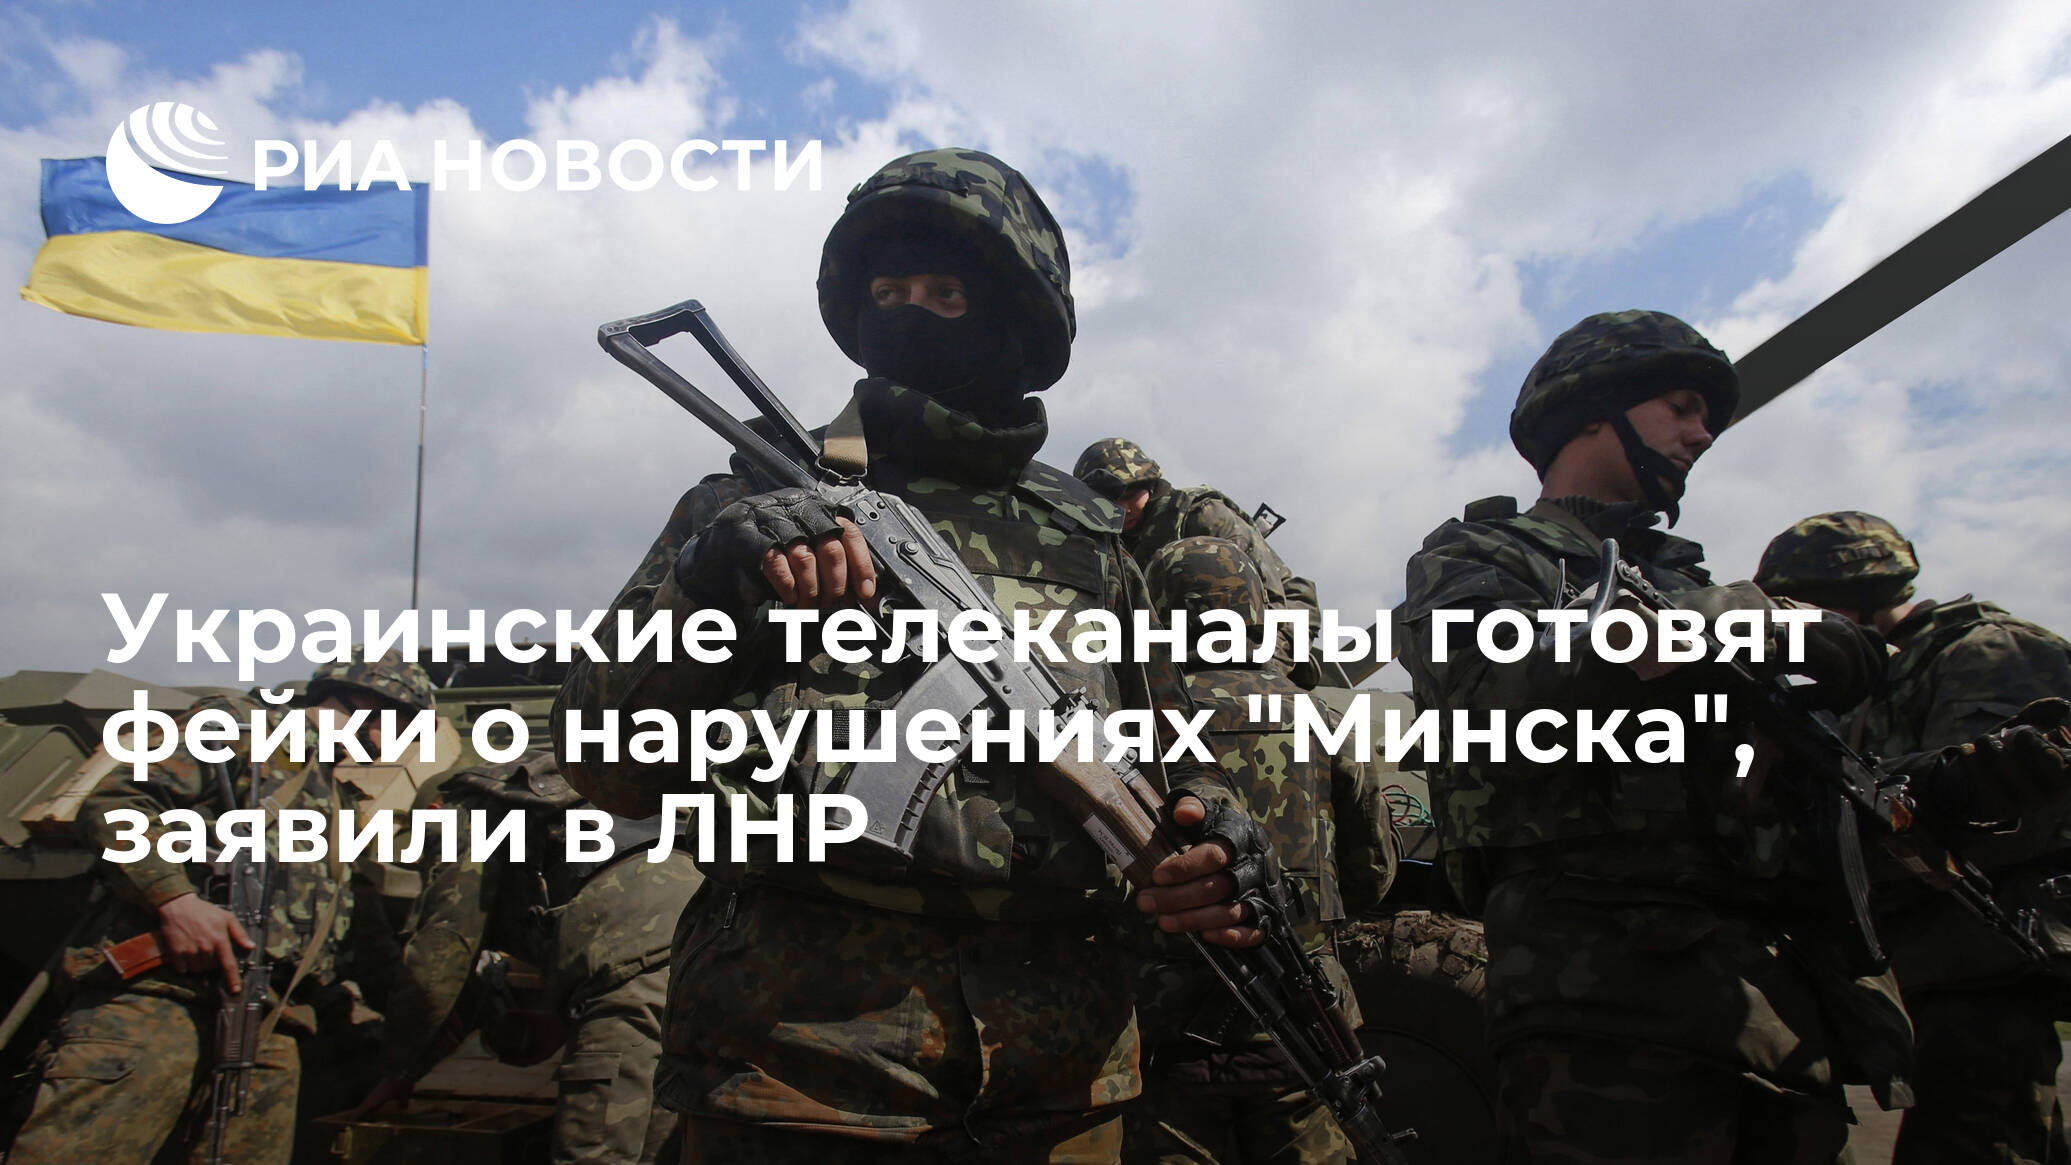 "Украинские телеканалы готовят фейки о нарушениях ""Минска"", заявили в ЛНР"